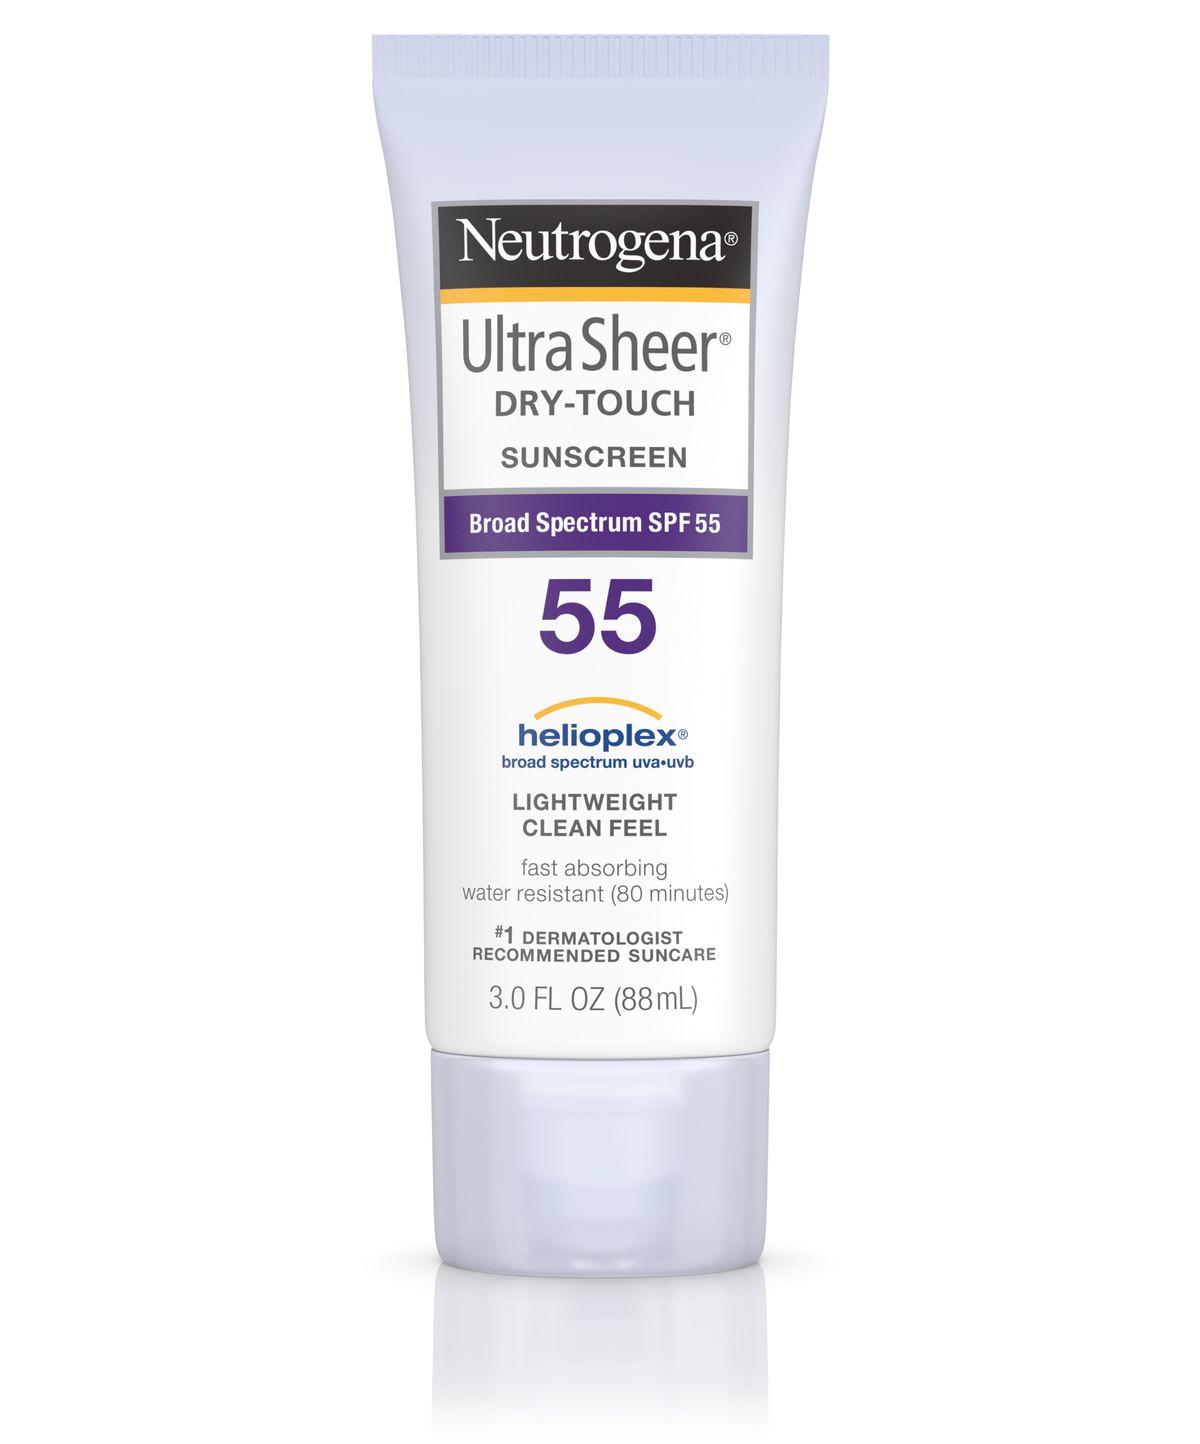 Neutrogena Ultra Sheer Dry-Touch Sunscreen Broad Spectrum Spf 55